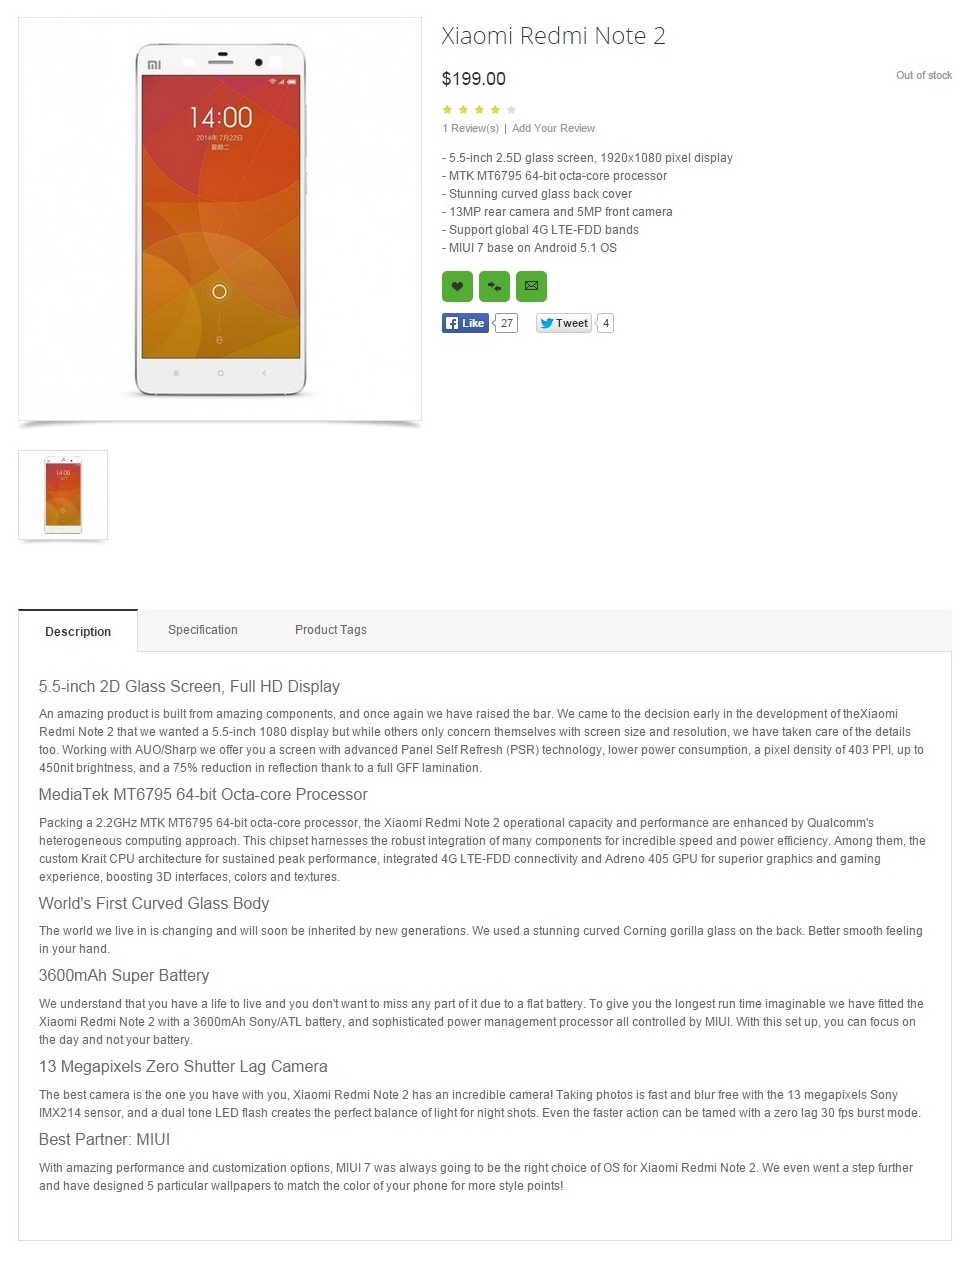 Xiaomi Redmi Note 2 specs leaked by retailer